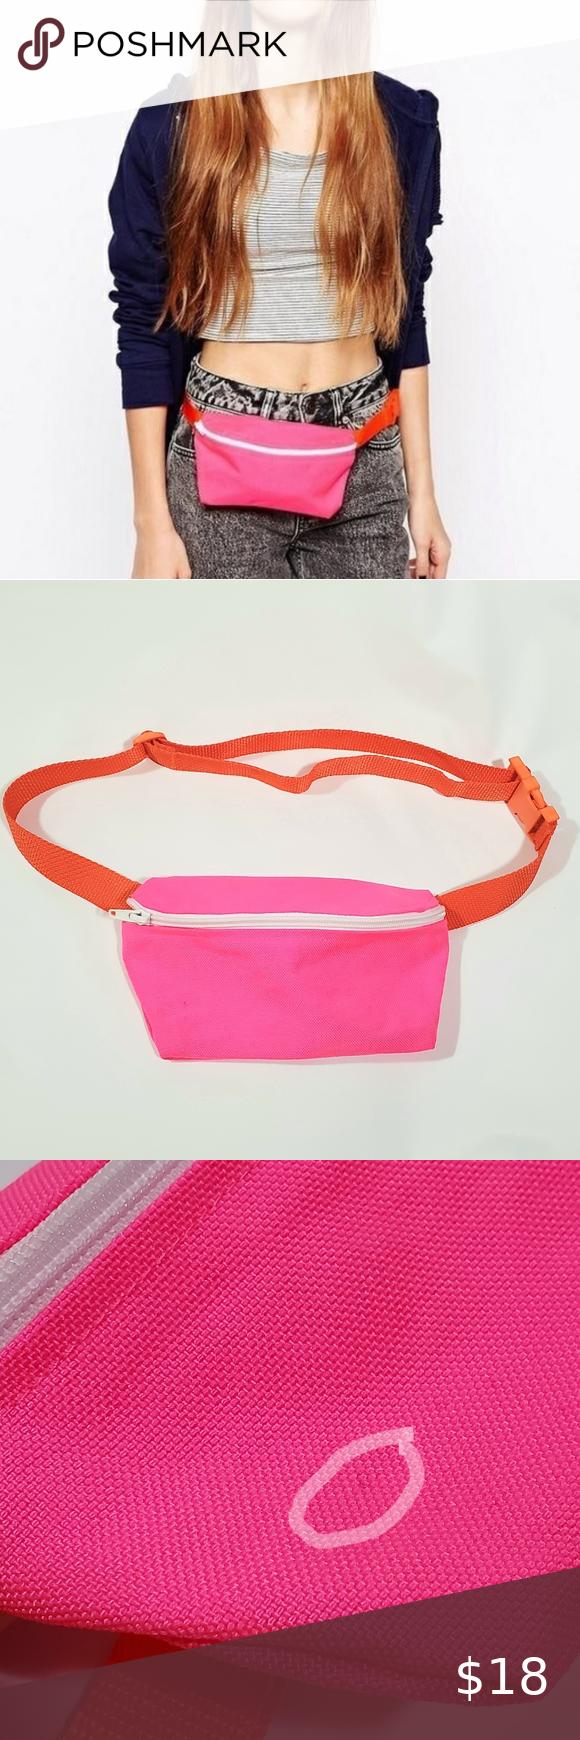 Neon pink contrast bumbag